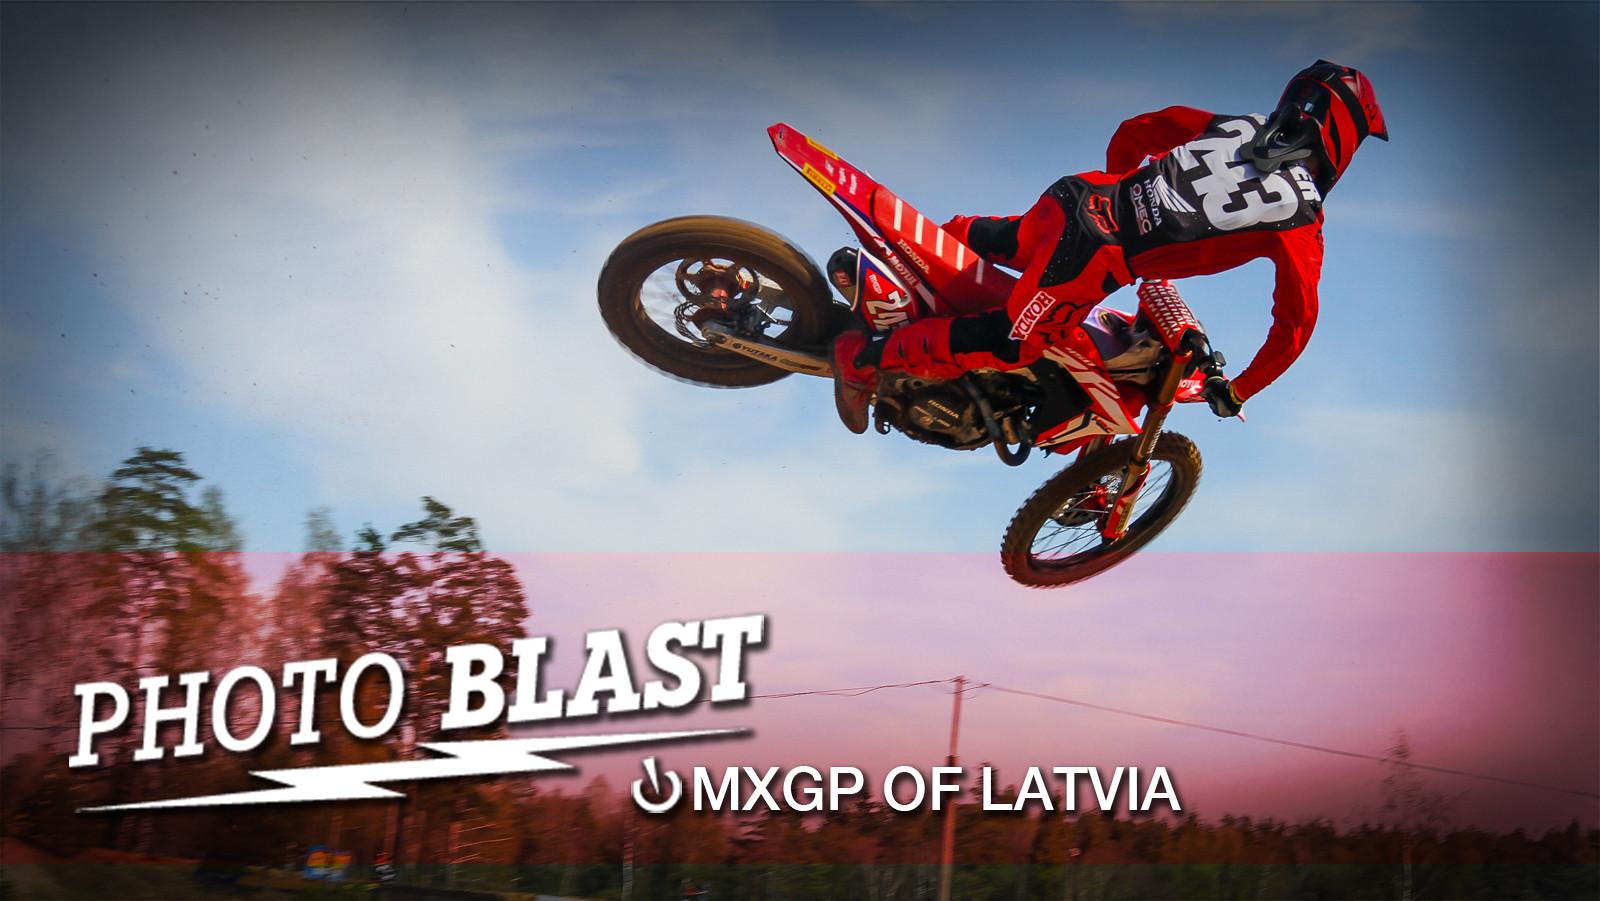 Photo Blast: 2017 MXGP of Latvia - Tim Gajser - Photo Blast: 2017 MXGP of Latvia - Motocross Pictures - Vital MX